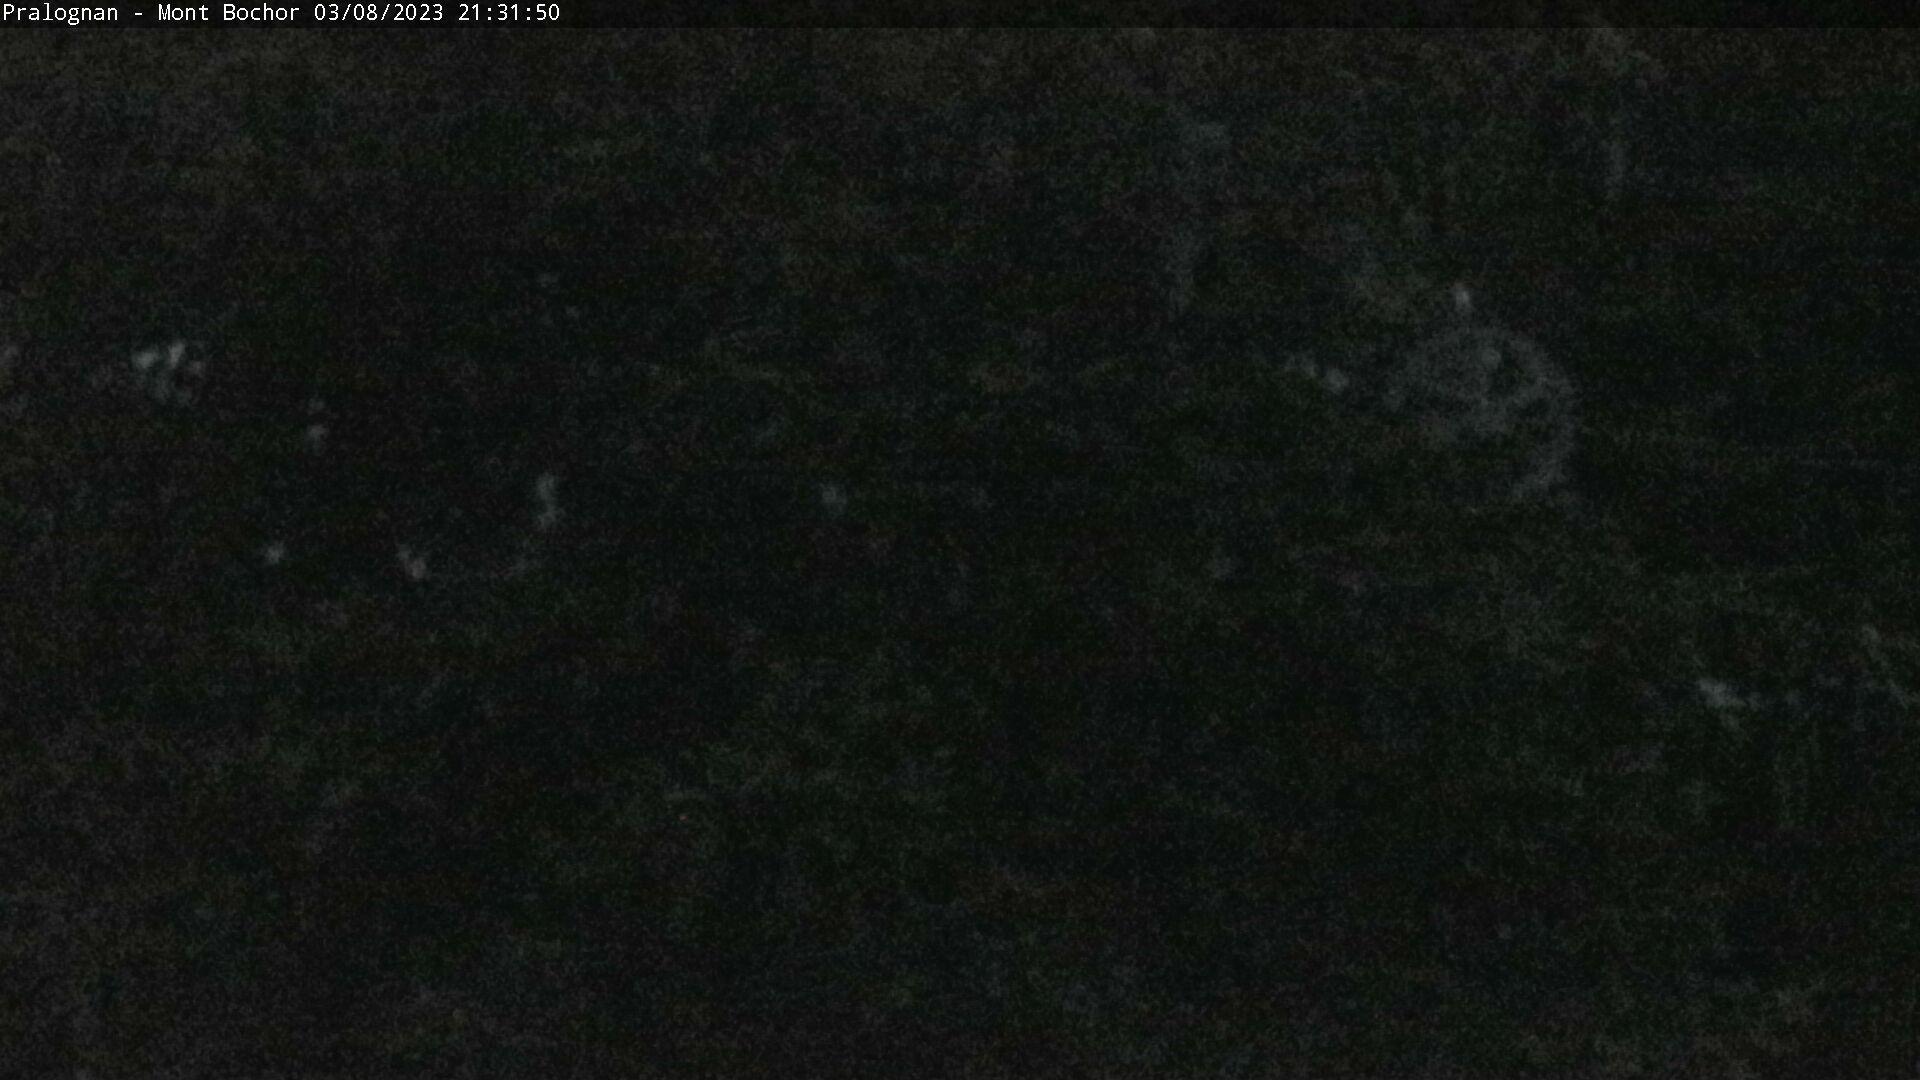 Pralognan la Vanoise Web Cam